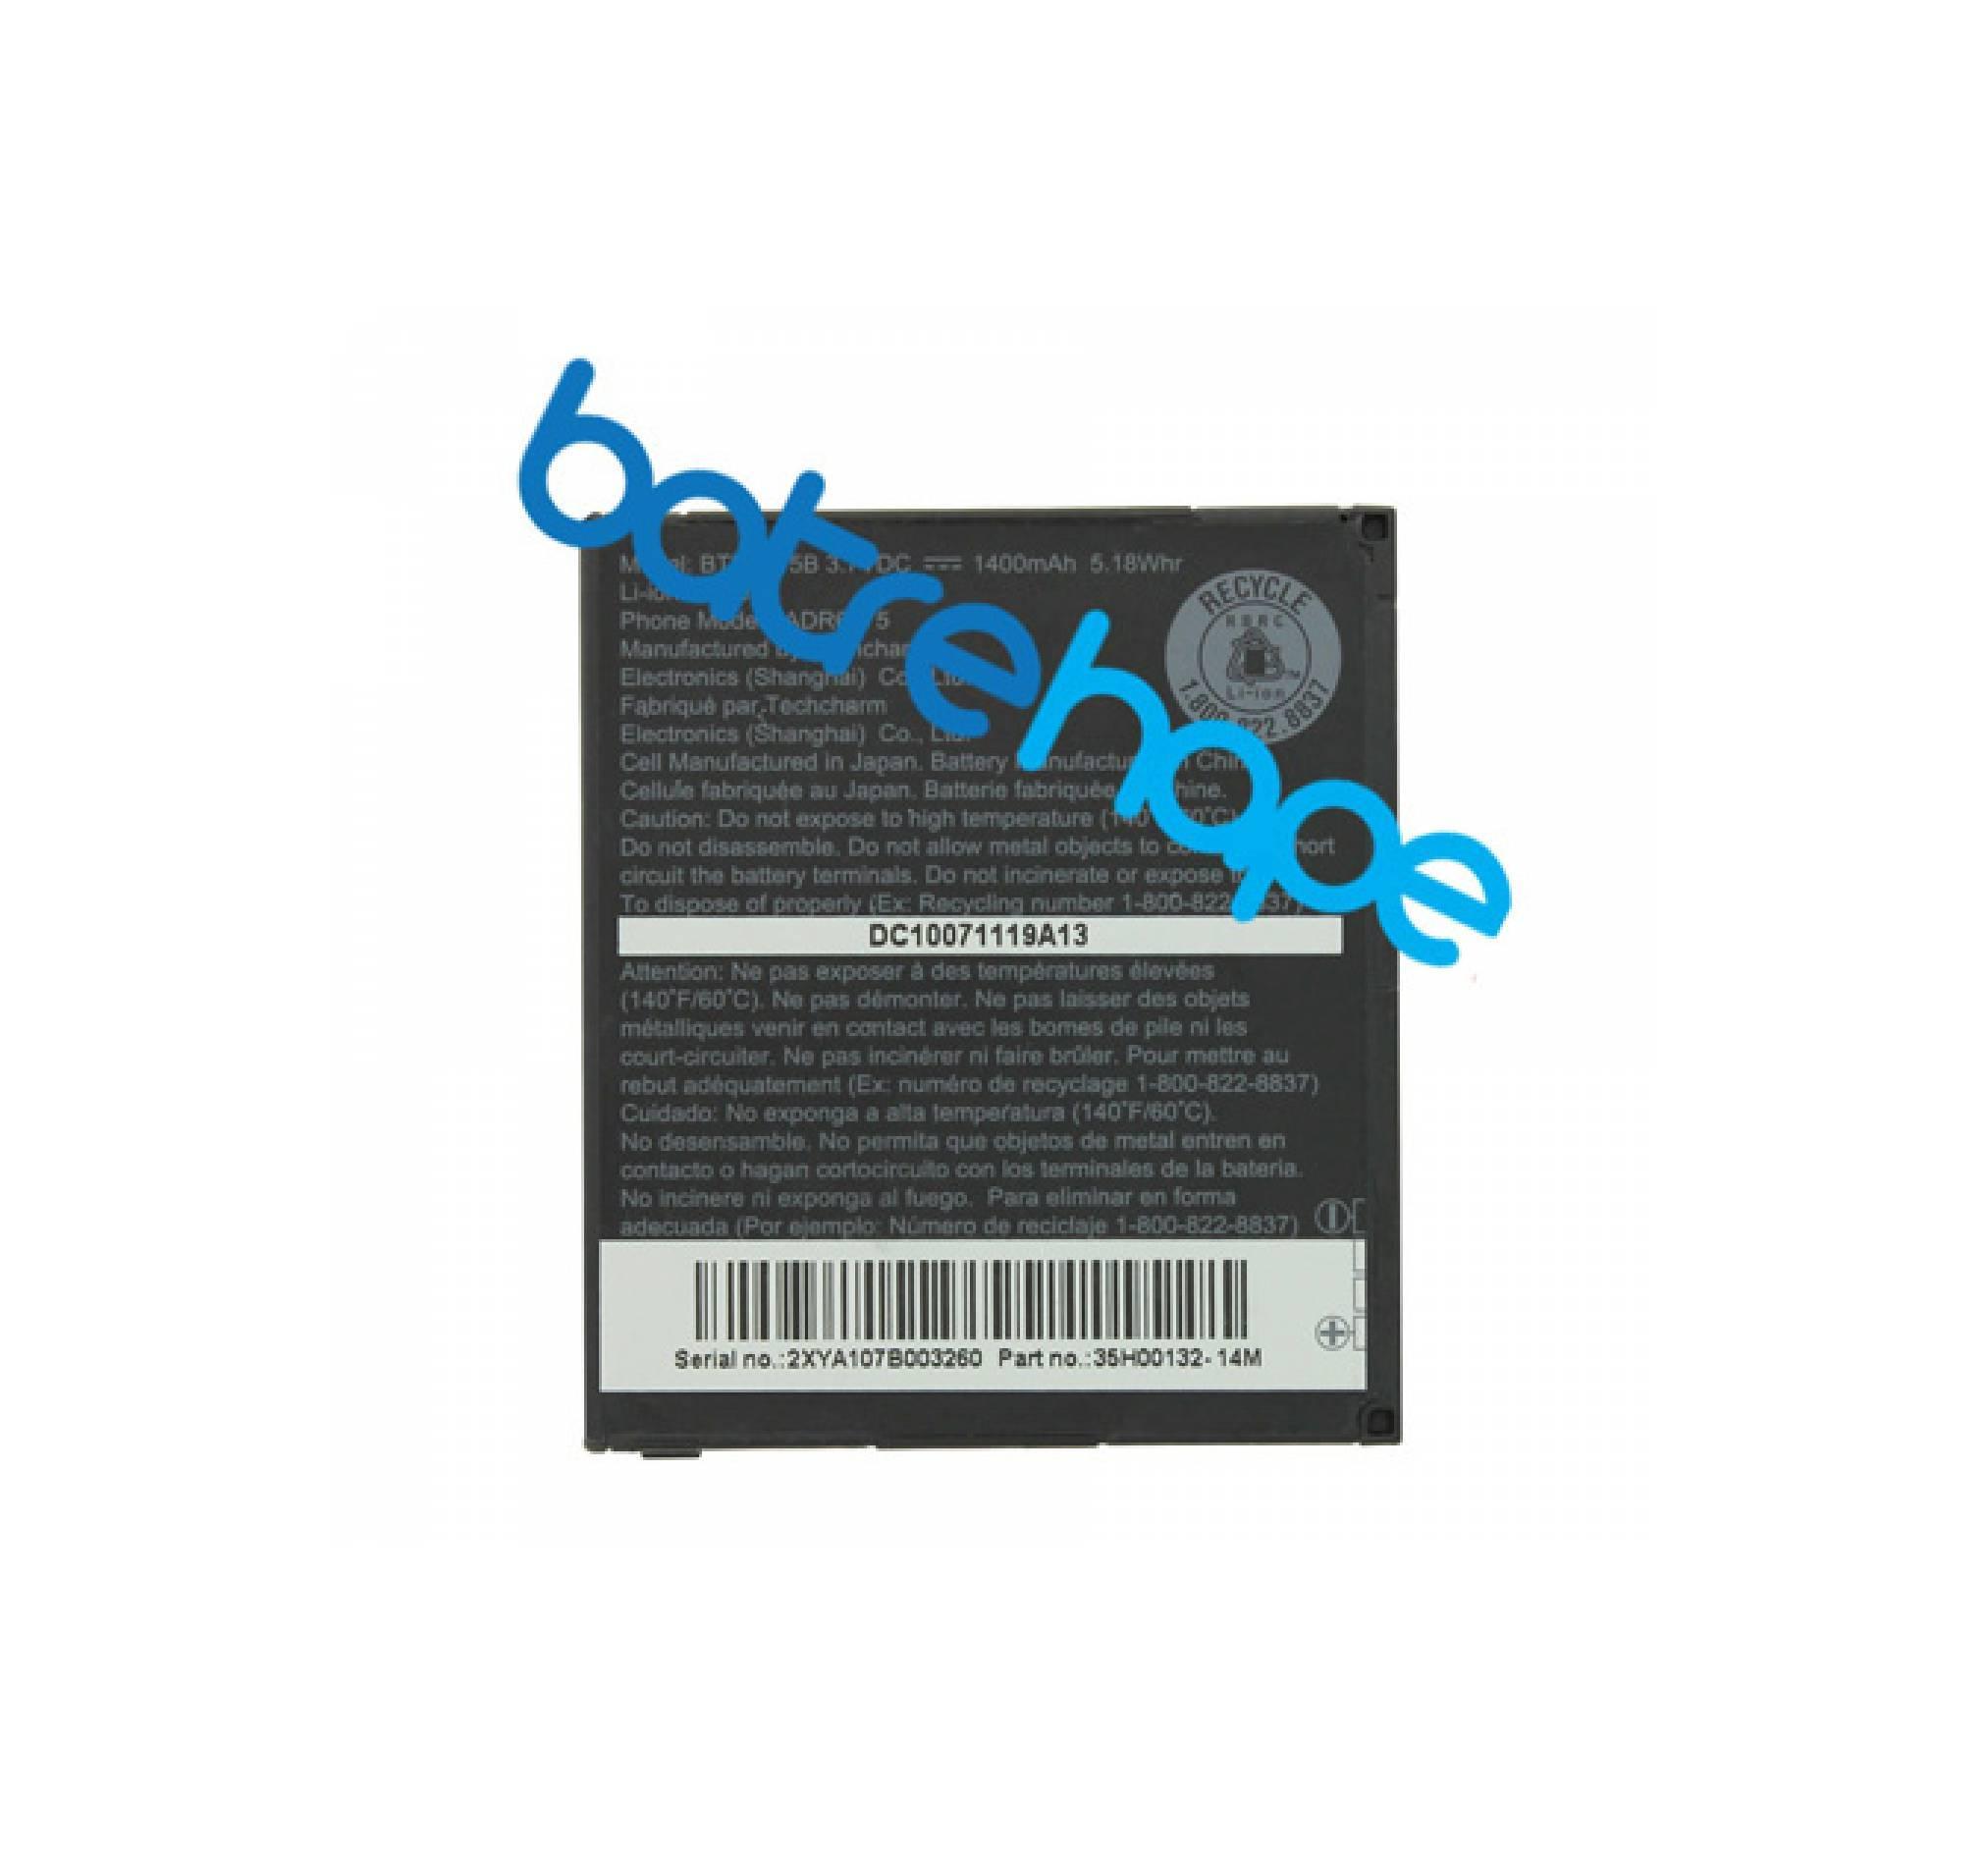 Baterai HTC Desire A8181 Google Nexus One (BTR6275B BTR6275 ADR6275B)